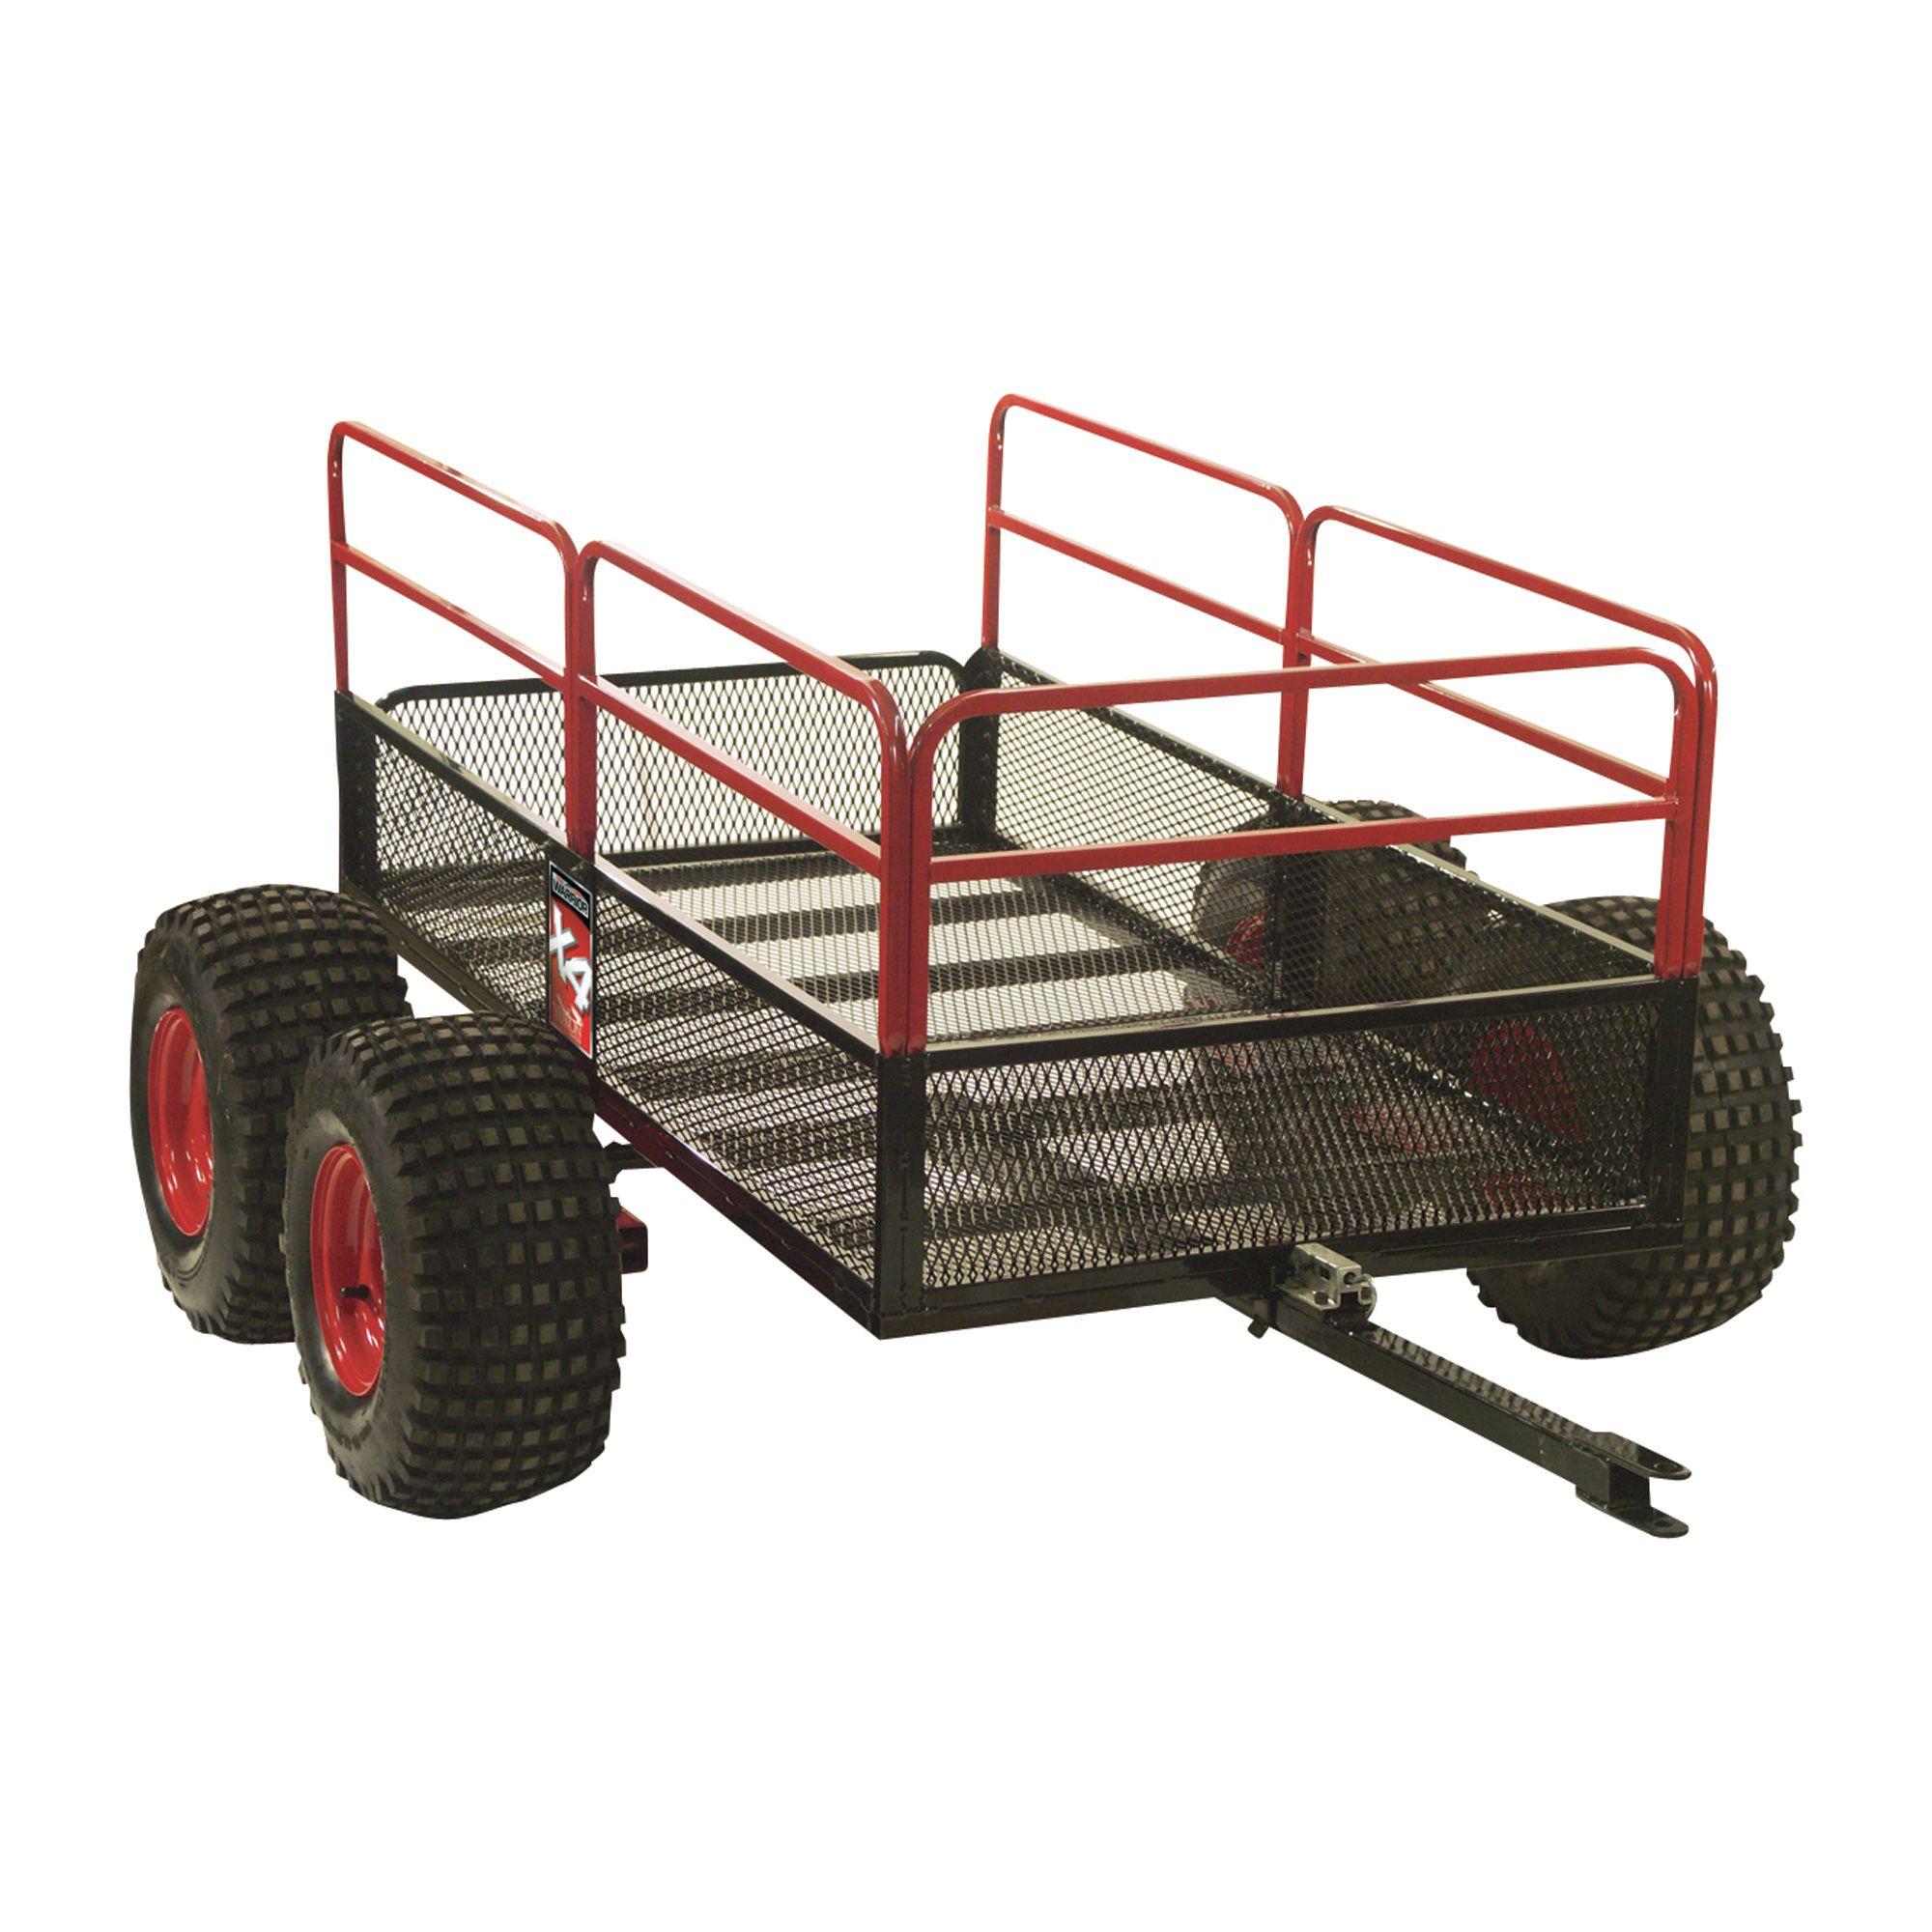 Yutrax Trail Warrior ATV Trailer — 4Wheels, 1,250Lb